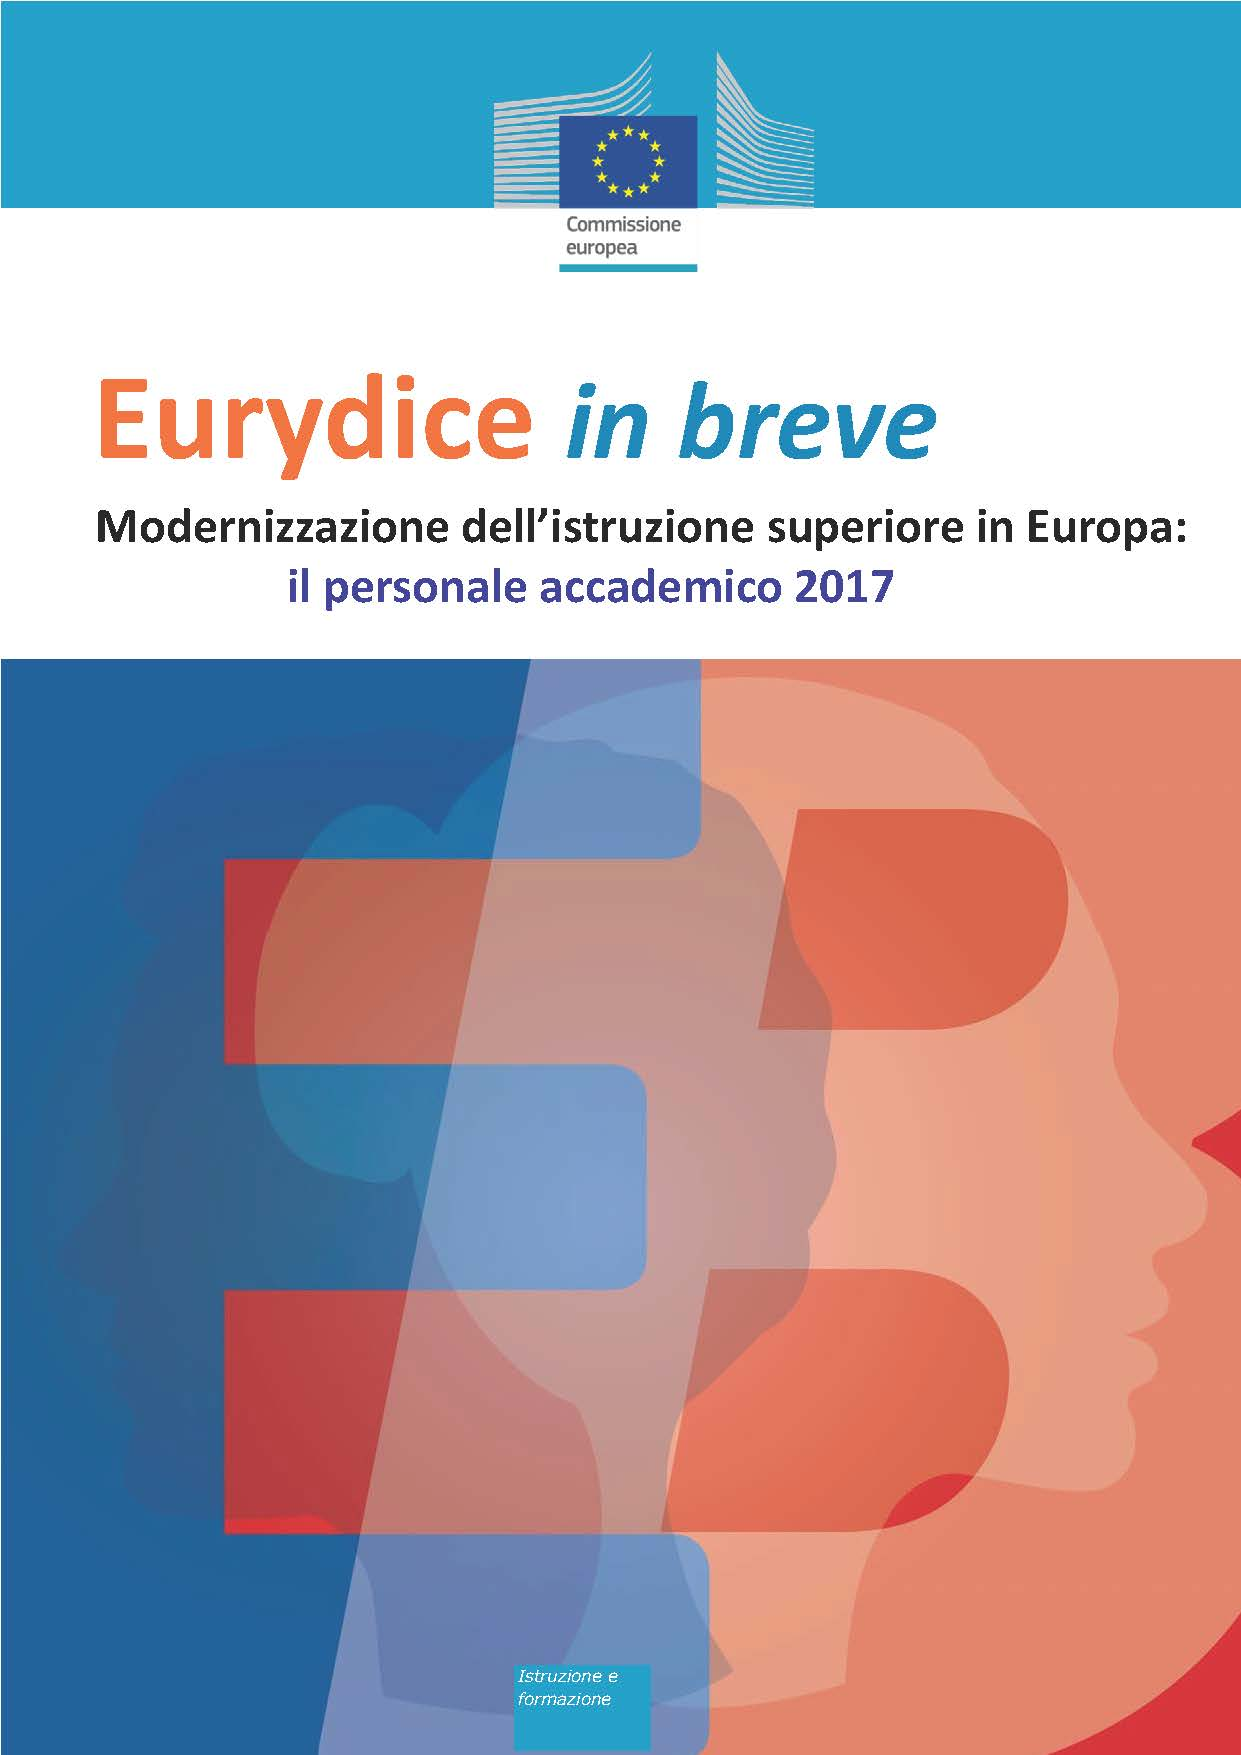 Eurydice_in_breve_Cover